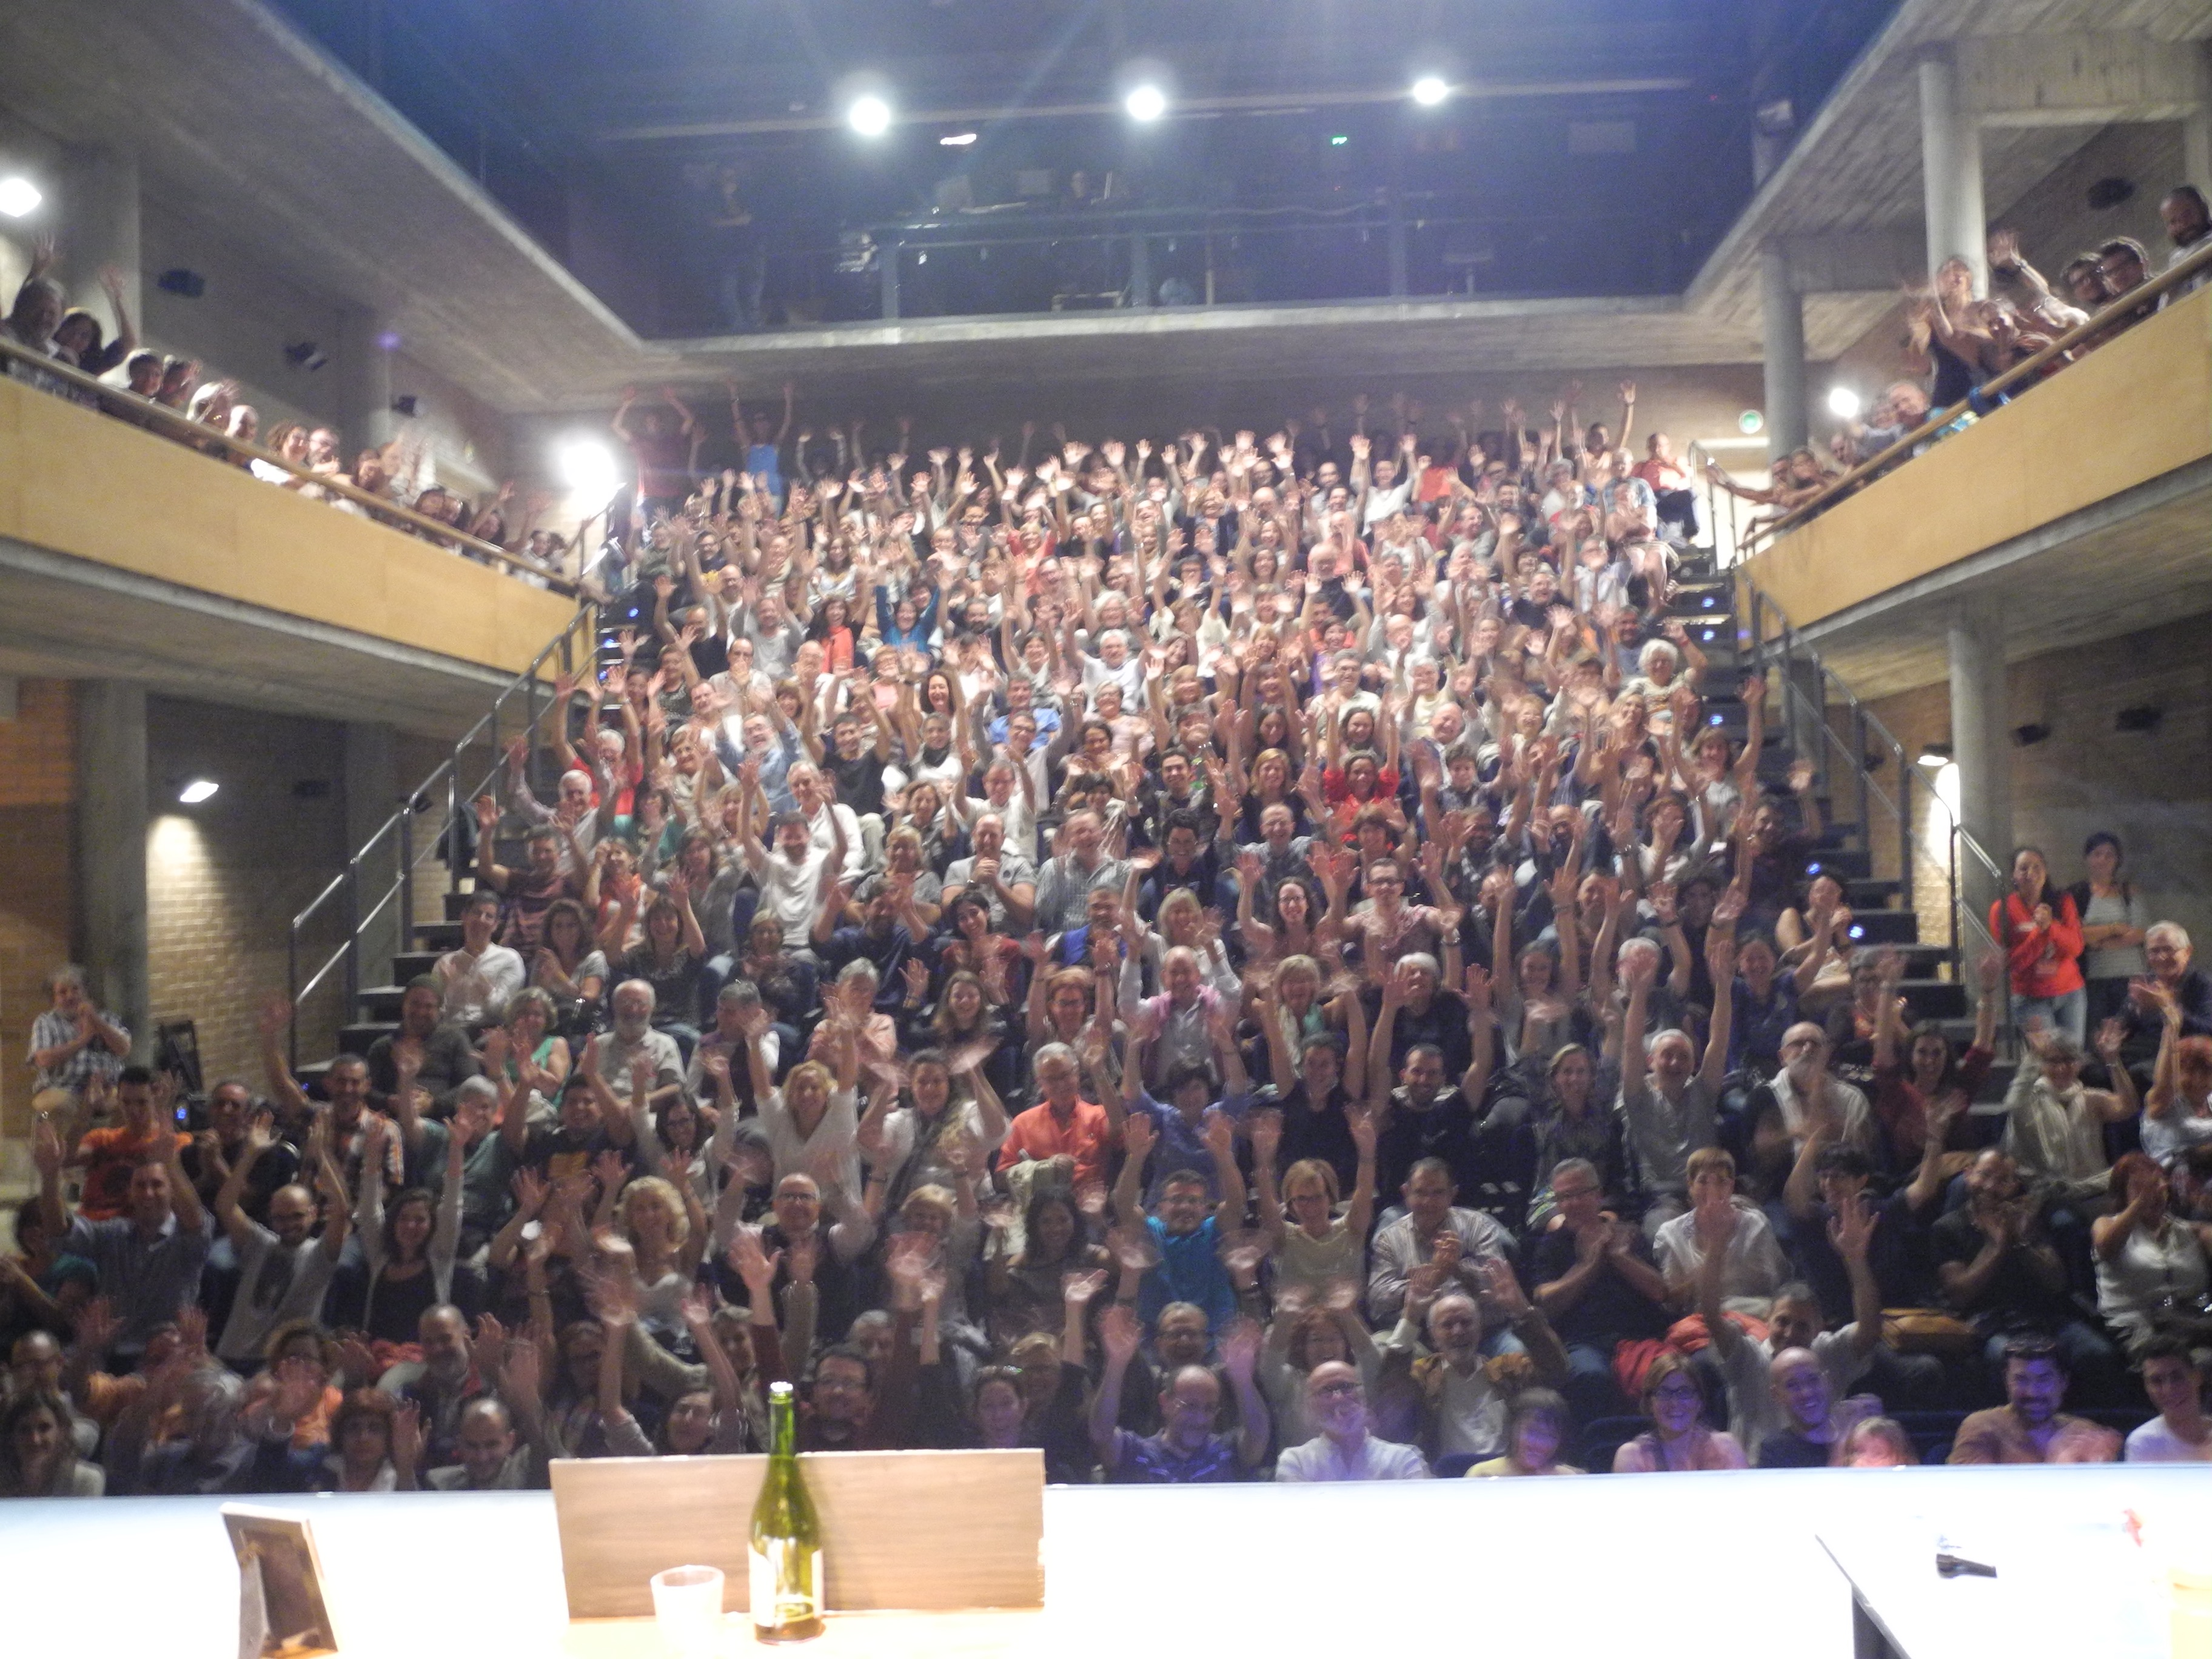 Girona, Spain - Temporada Alta